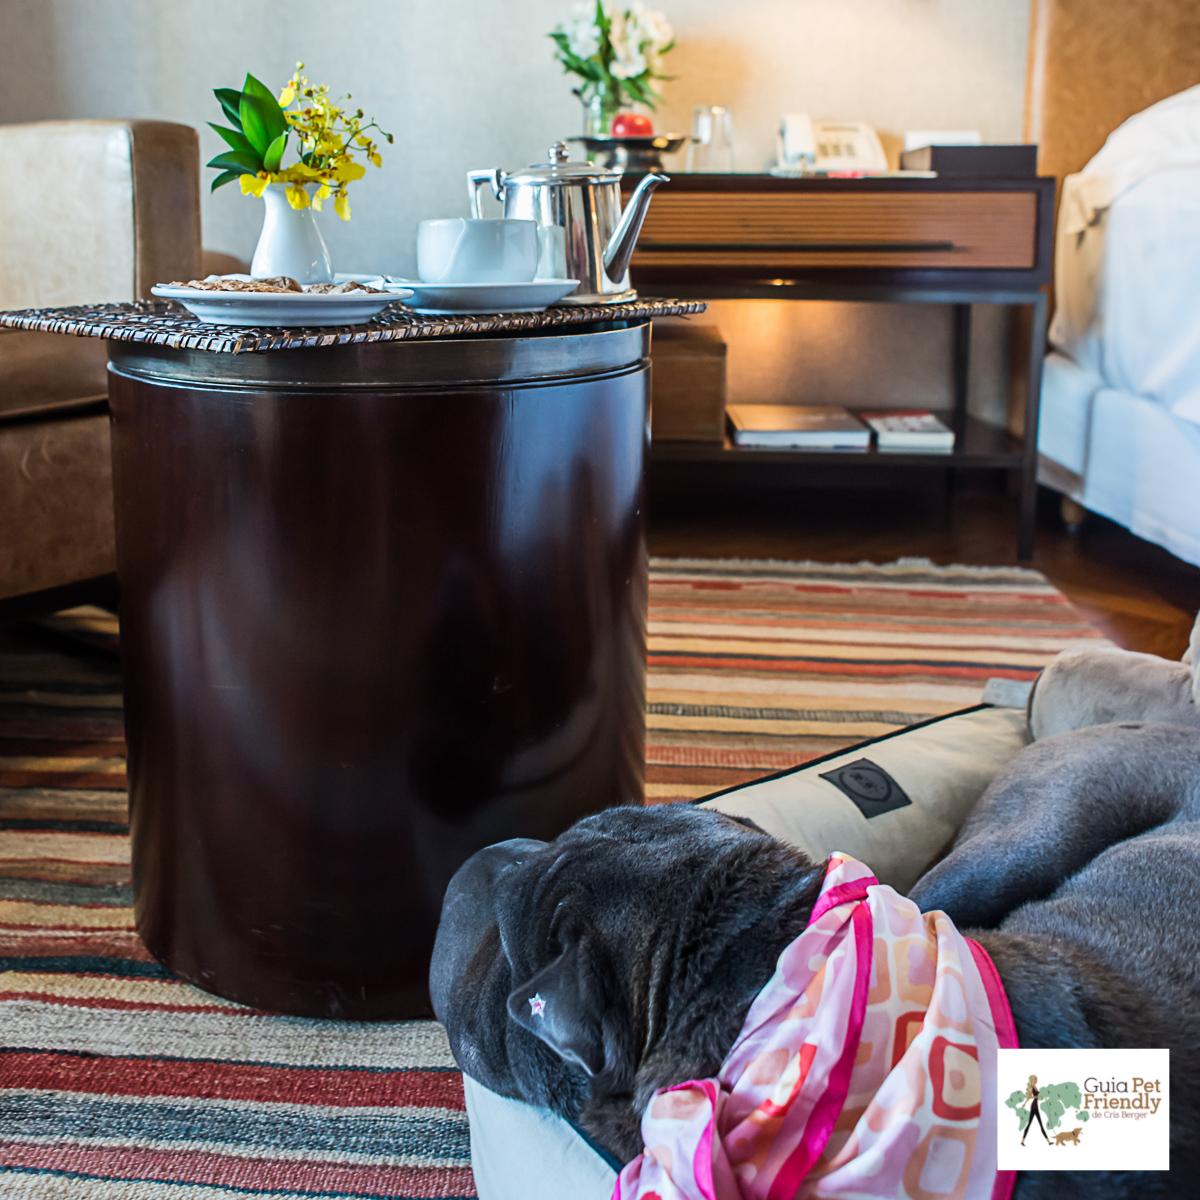 cachorro perto da mesa de chá